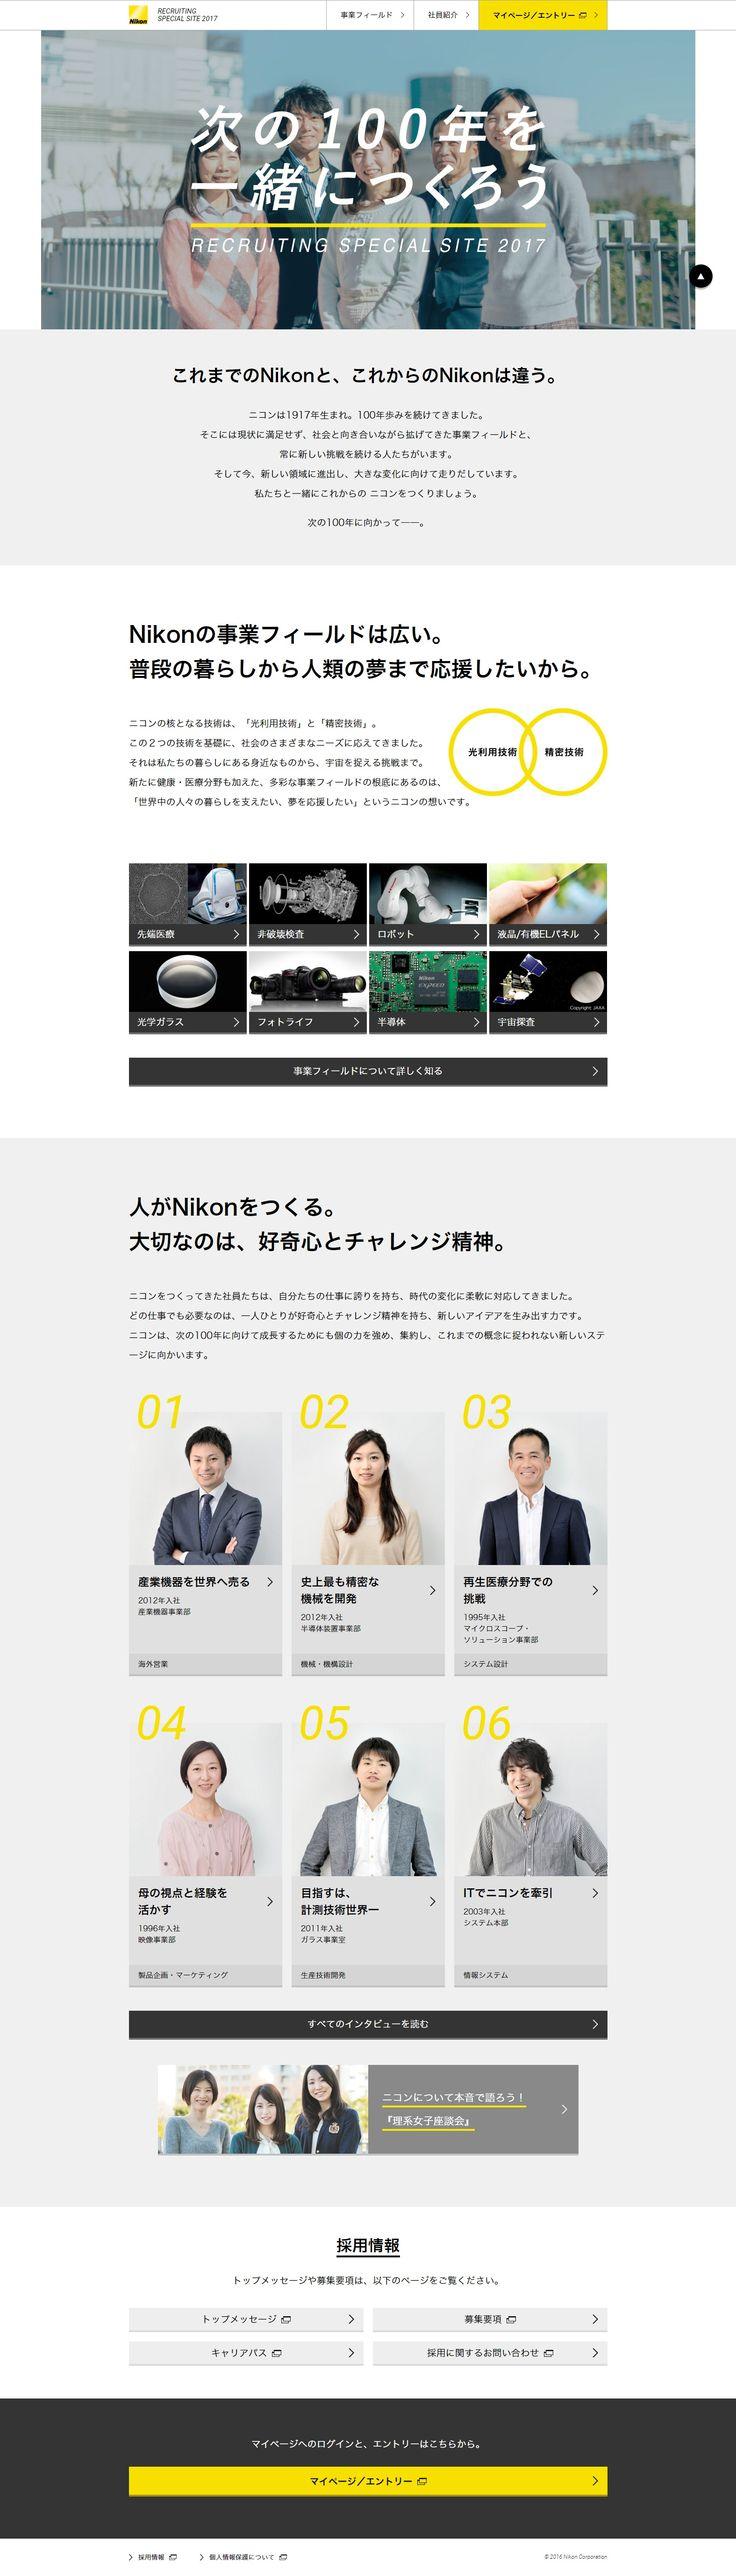 Nikon 光学機械器具の製造、ならびに販売